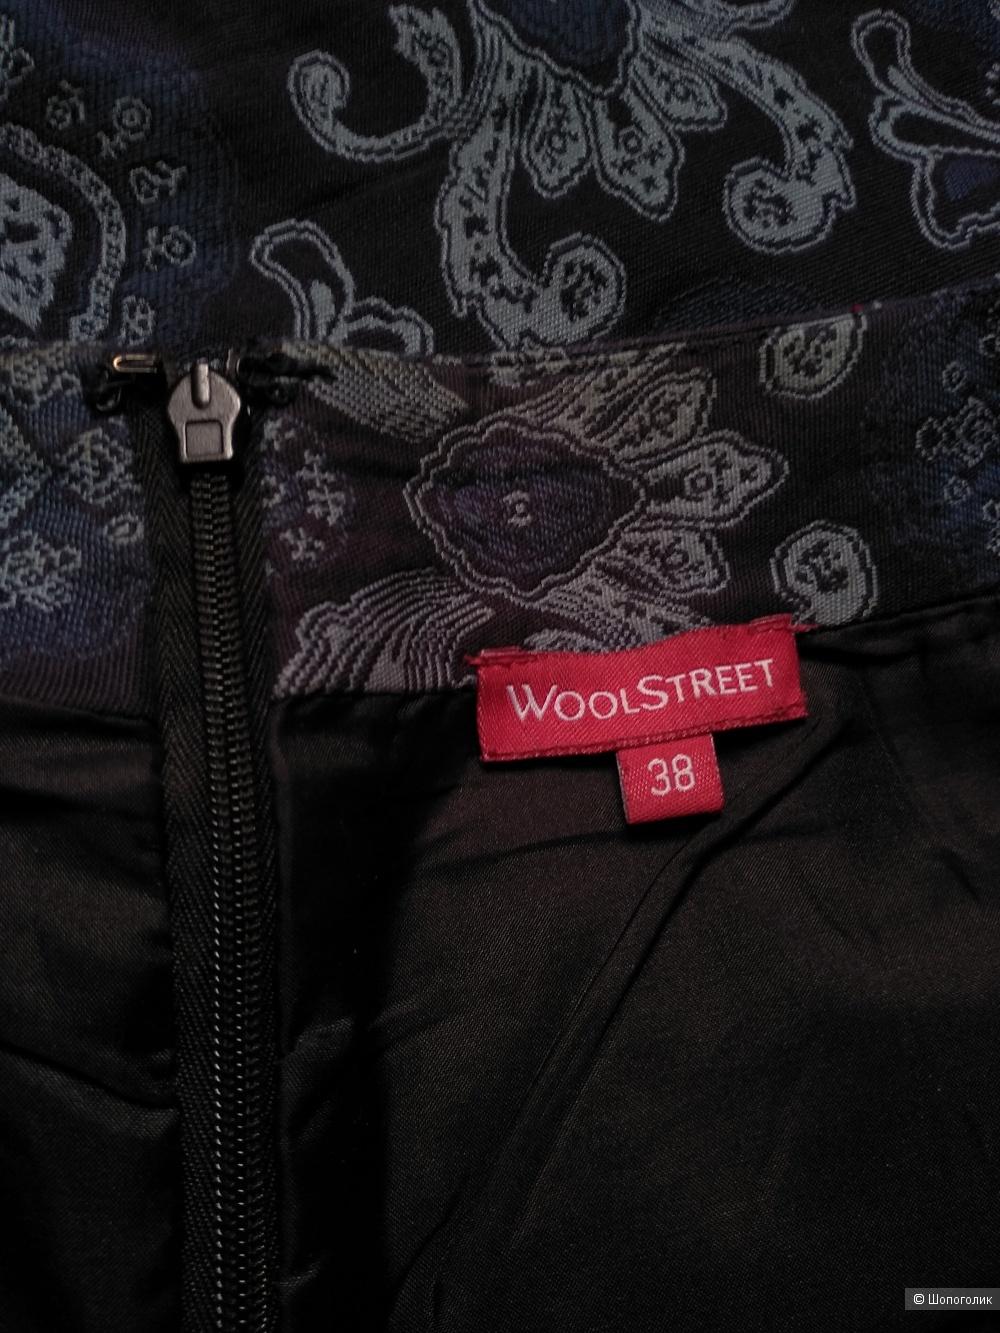 Юбка Wool Street, размер 38 (российский 46-48, примерно)